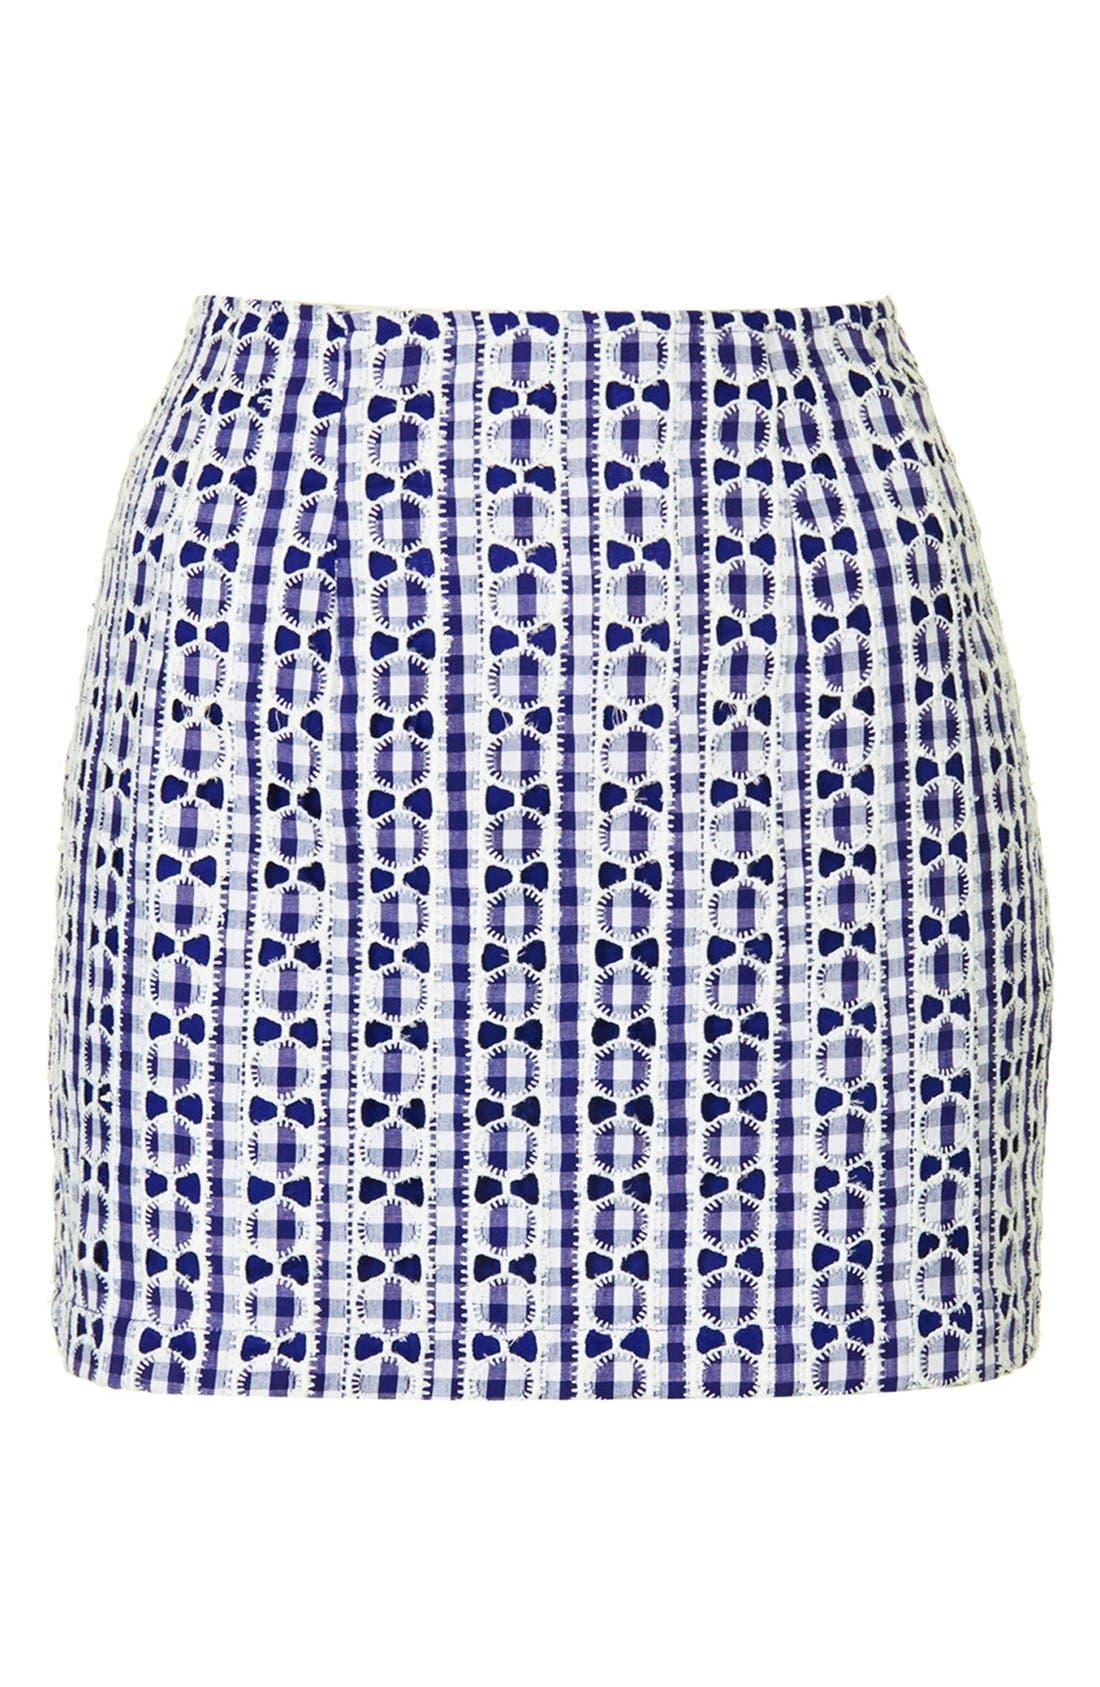 Alternate Image 3  - Topshop Lace Gingham Pelmet Skirt (Petite)